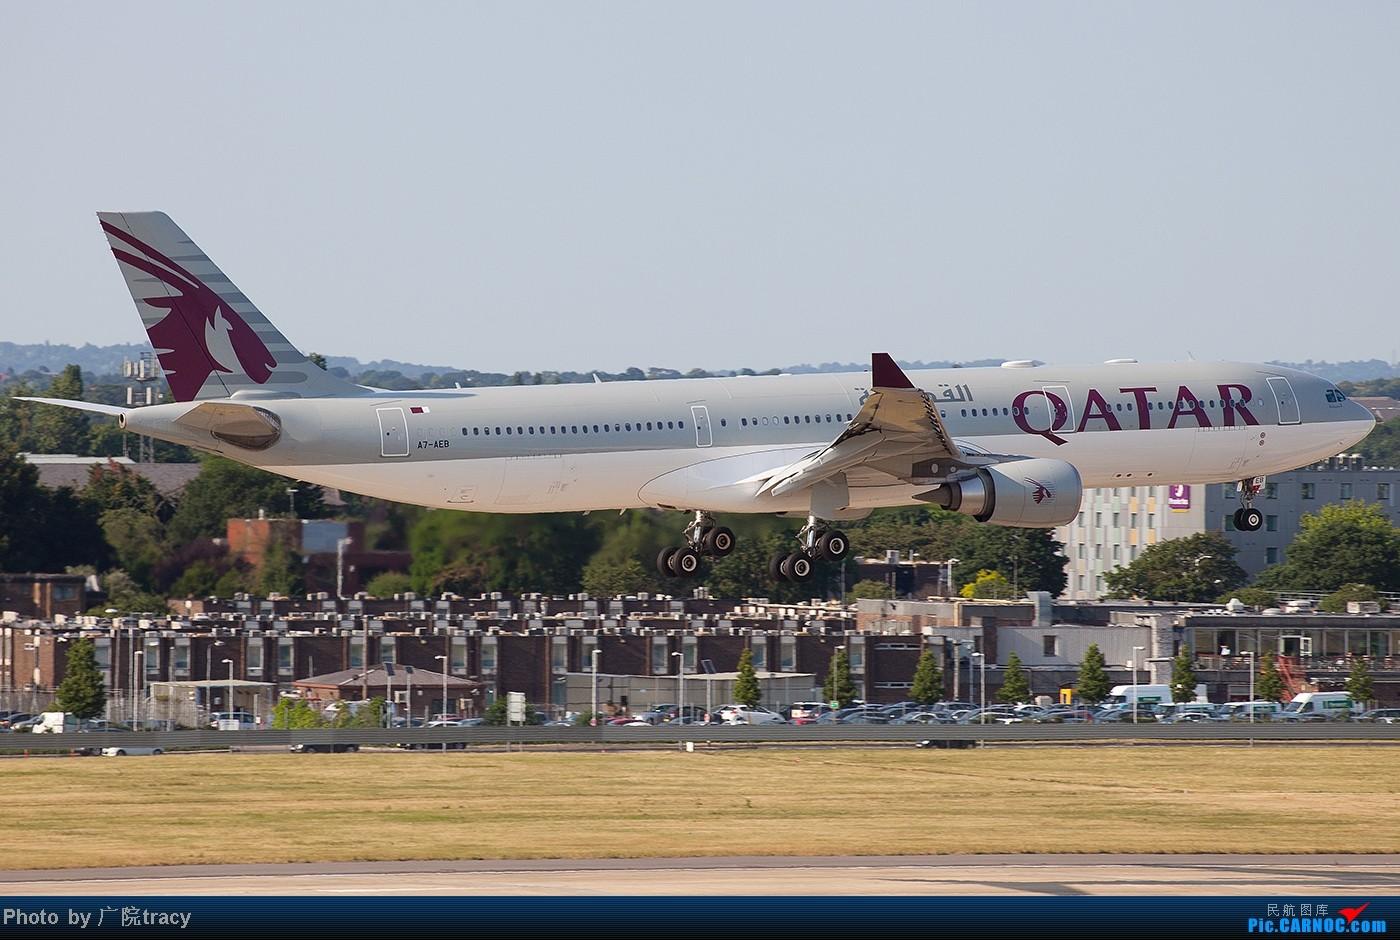 Re:[原创]★ ★ ★ ★ ★中东的航空公司在伦敦希斯罗国际机场  ★ ★ ★ ★ ★ AIRBUS A330-300 A7-AEB 英国伦敦希思罗机场